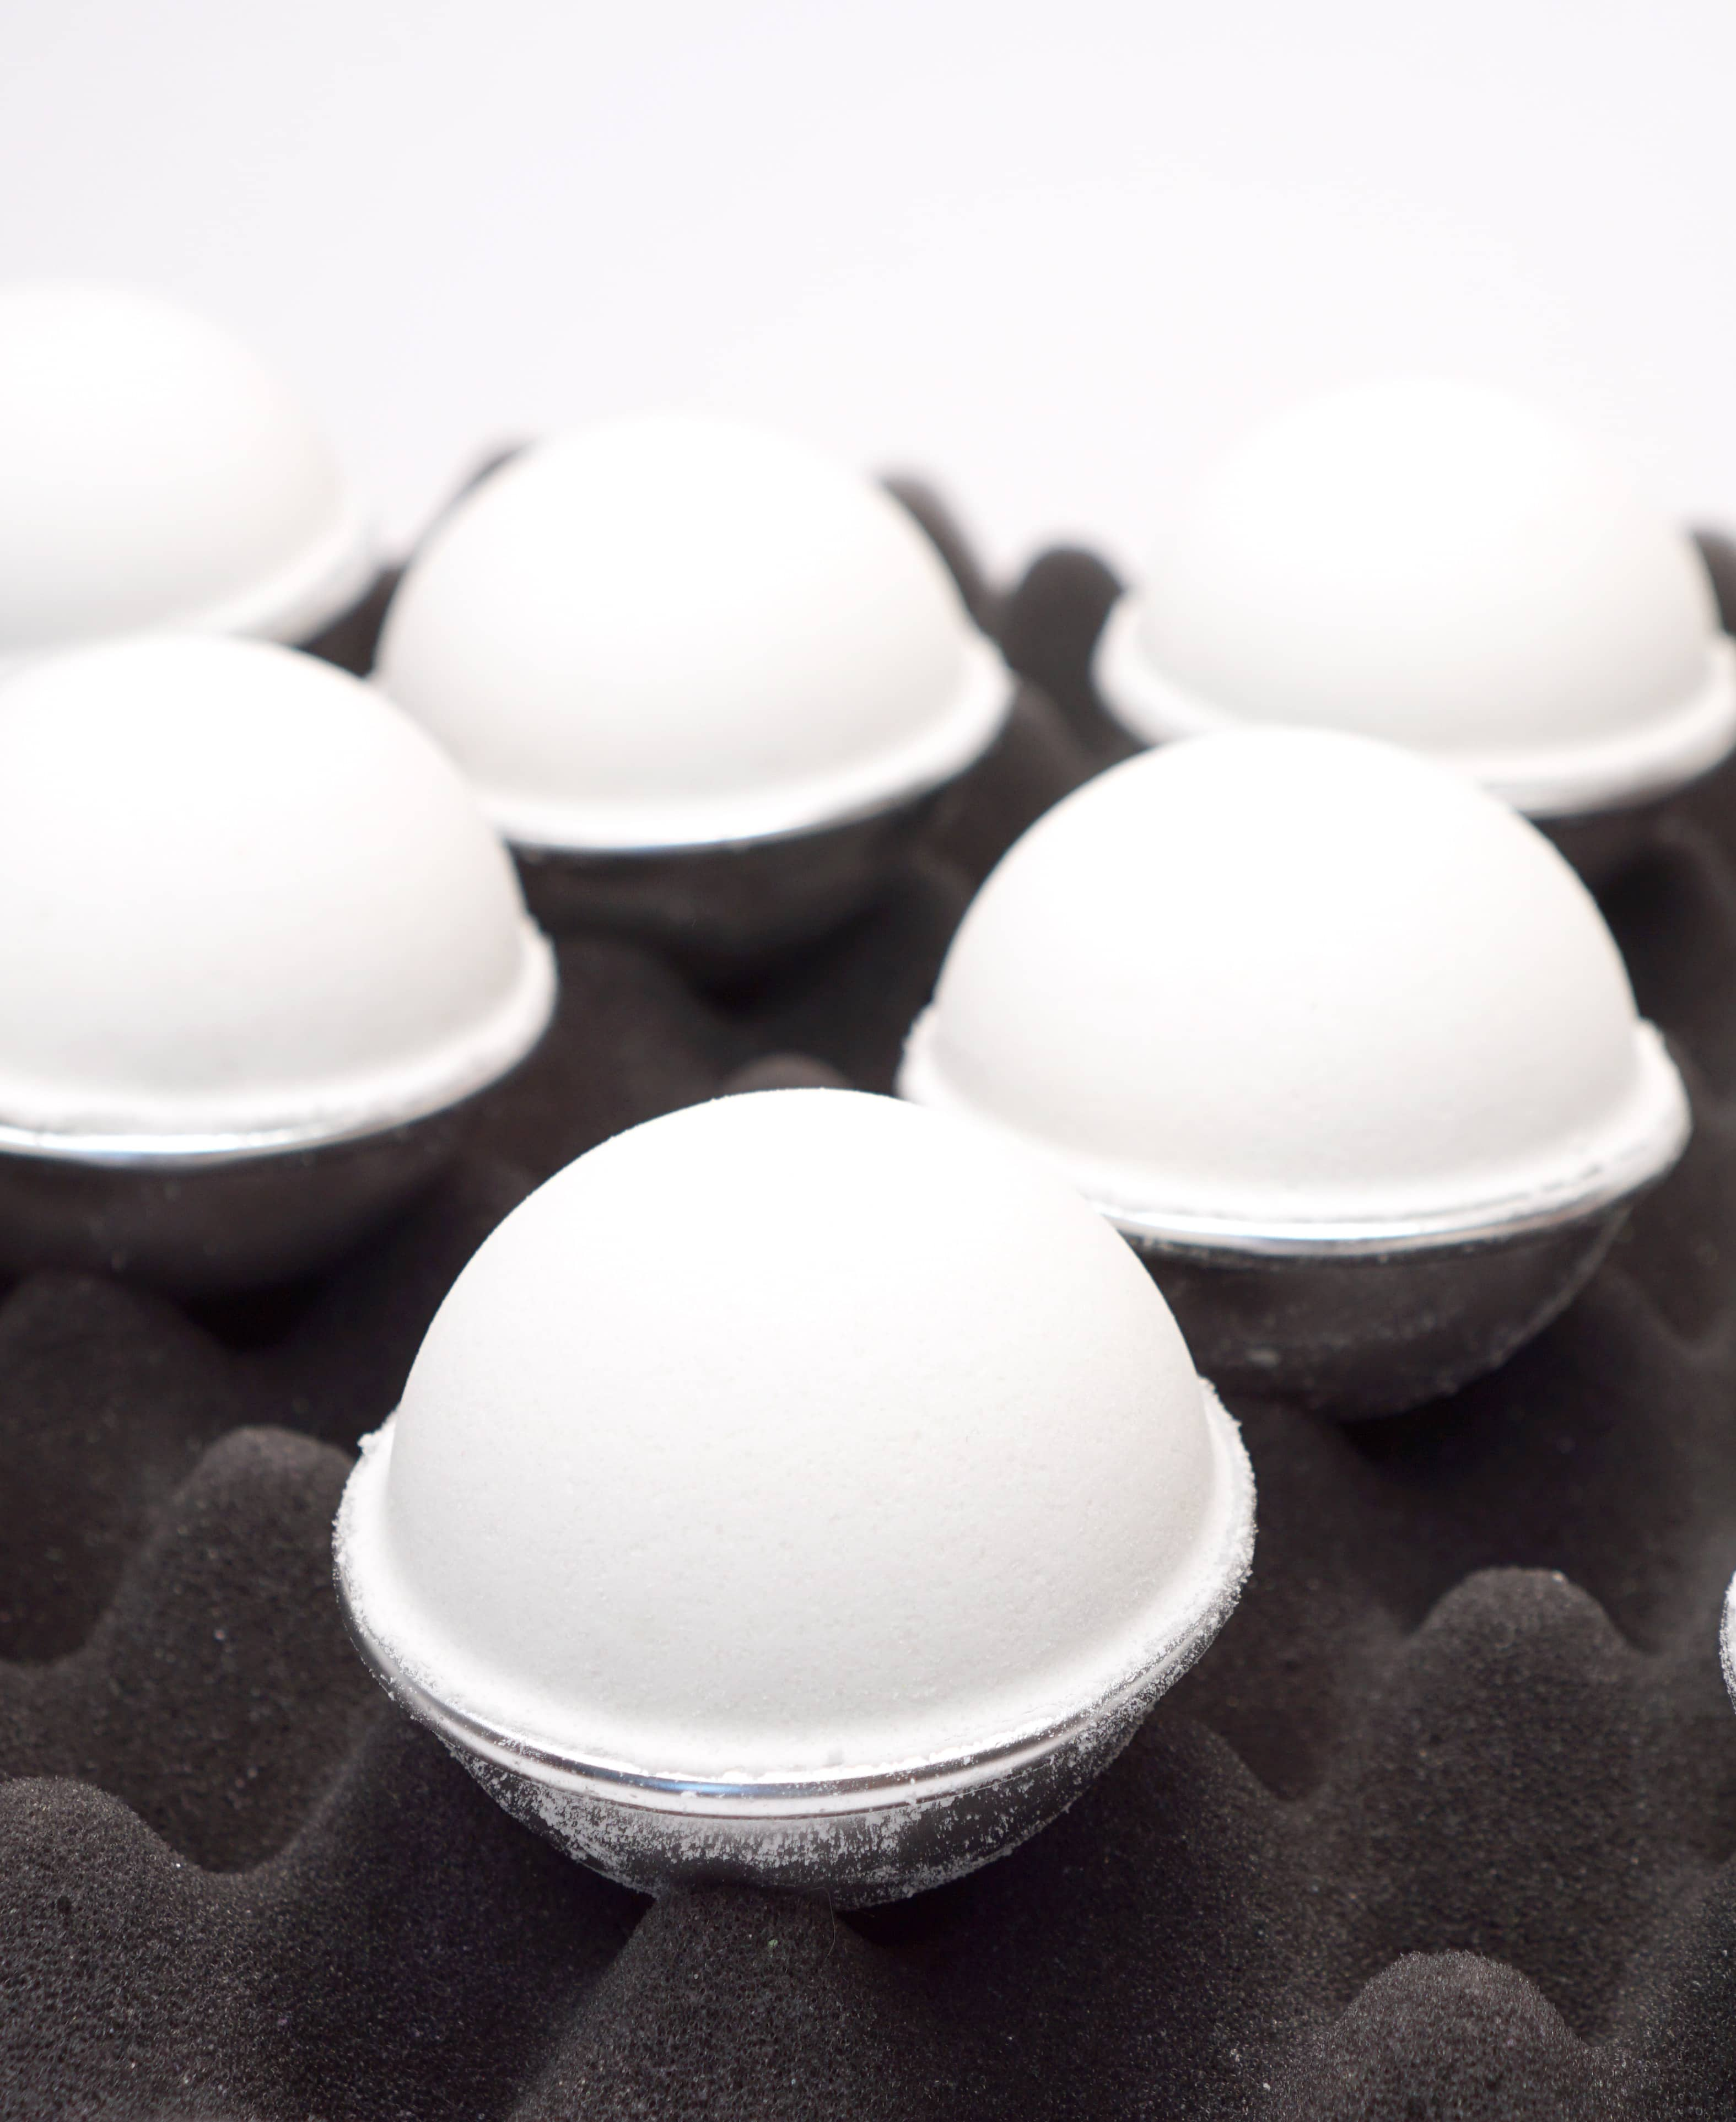 Bath bombs drying on egg crate foam